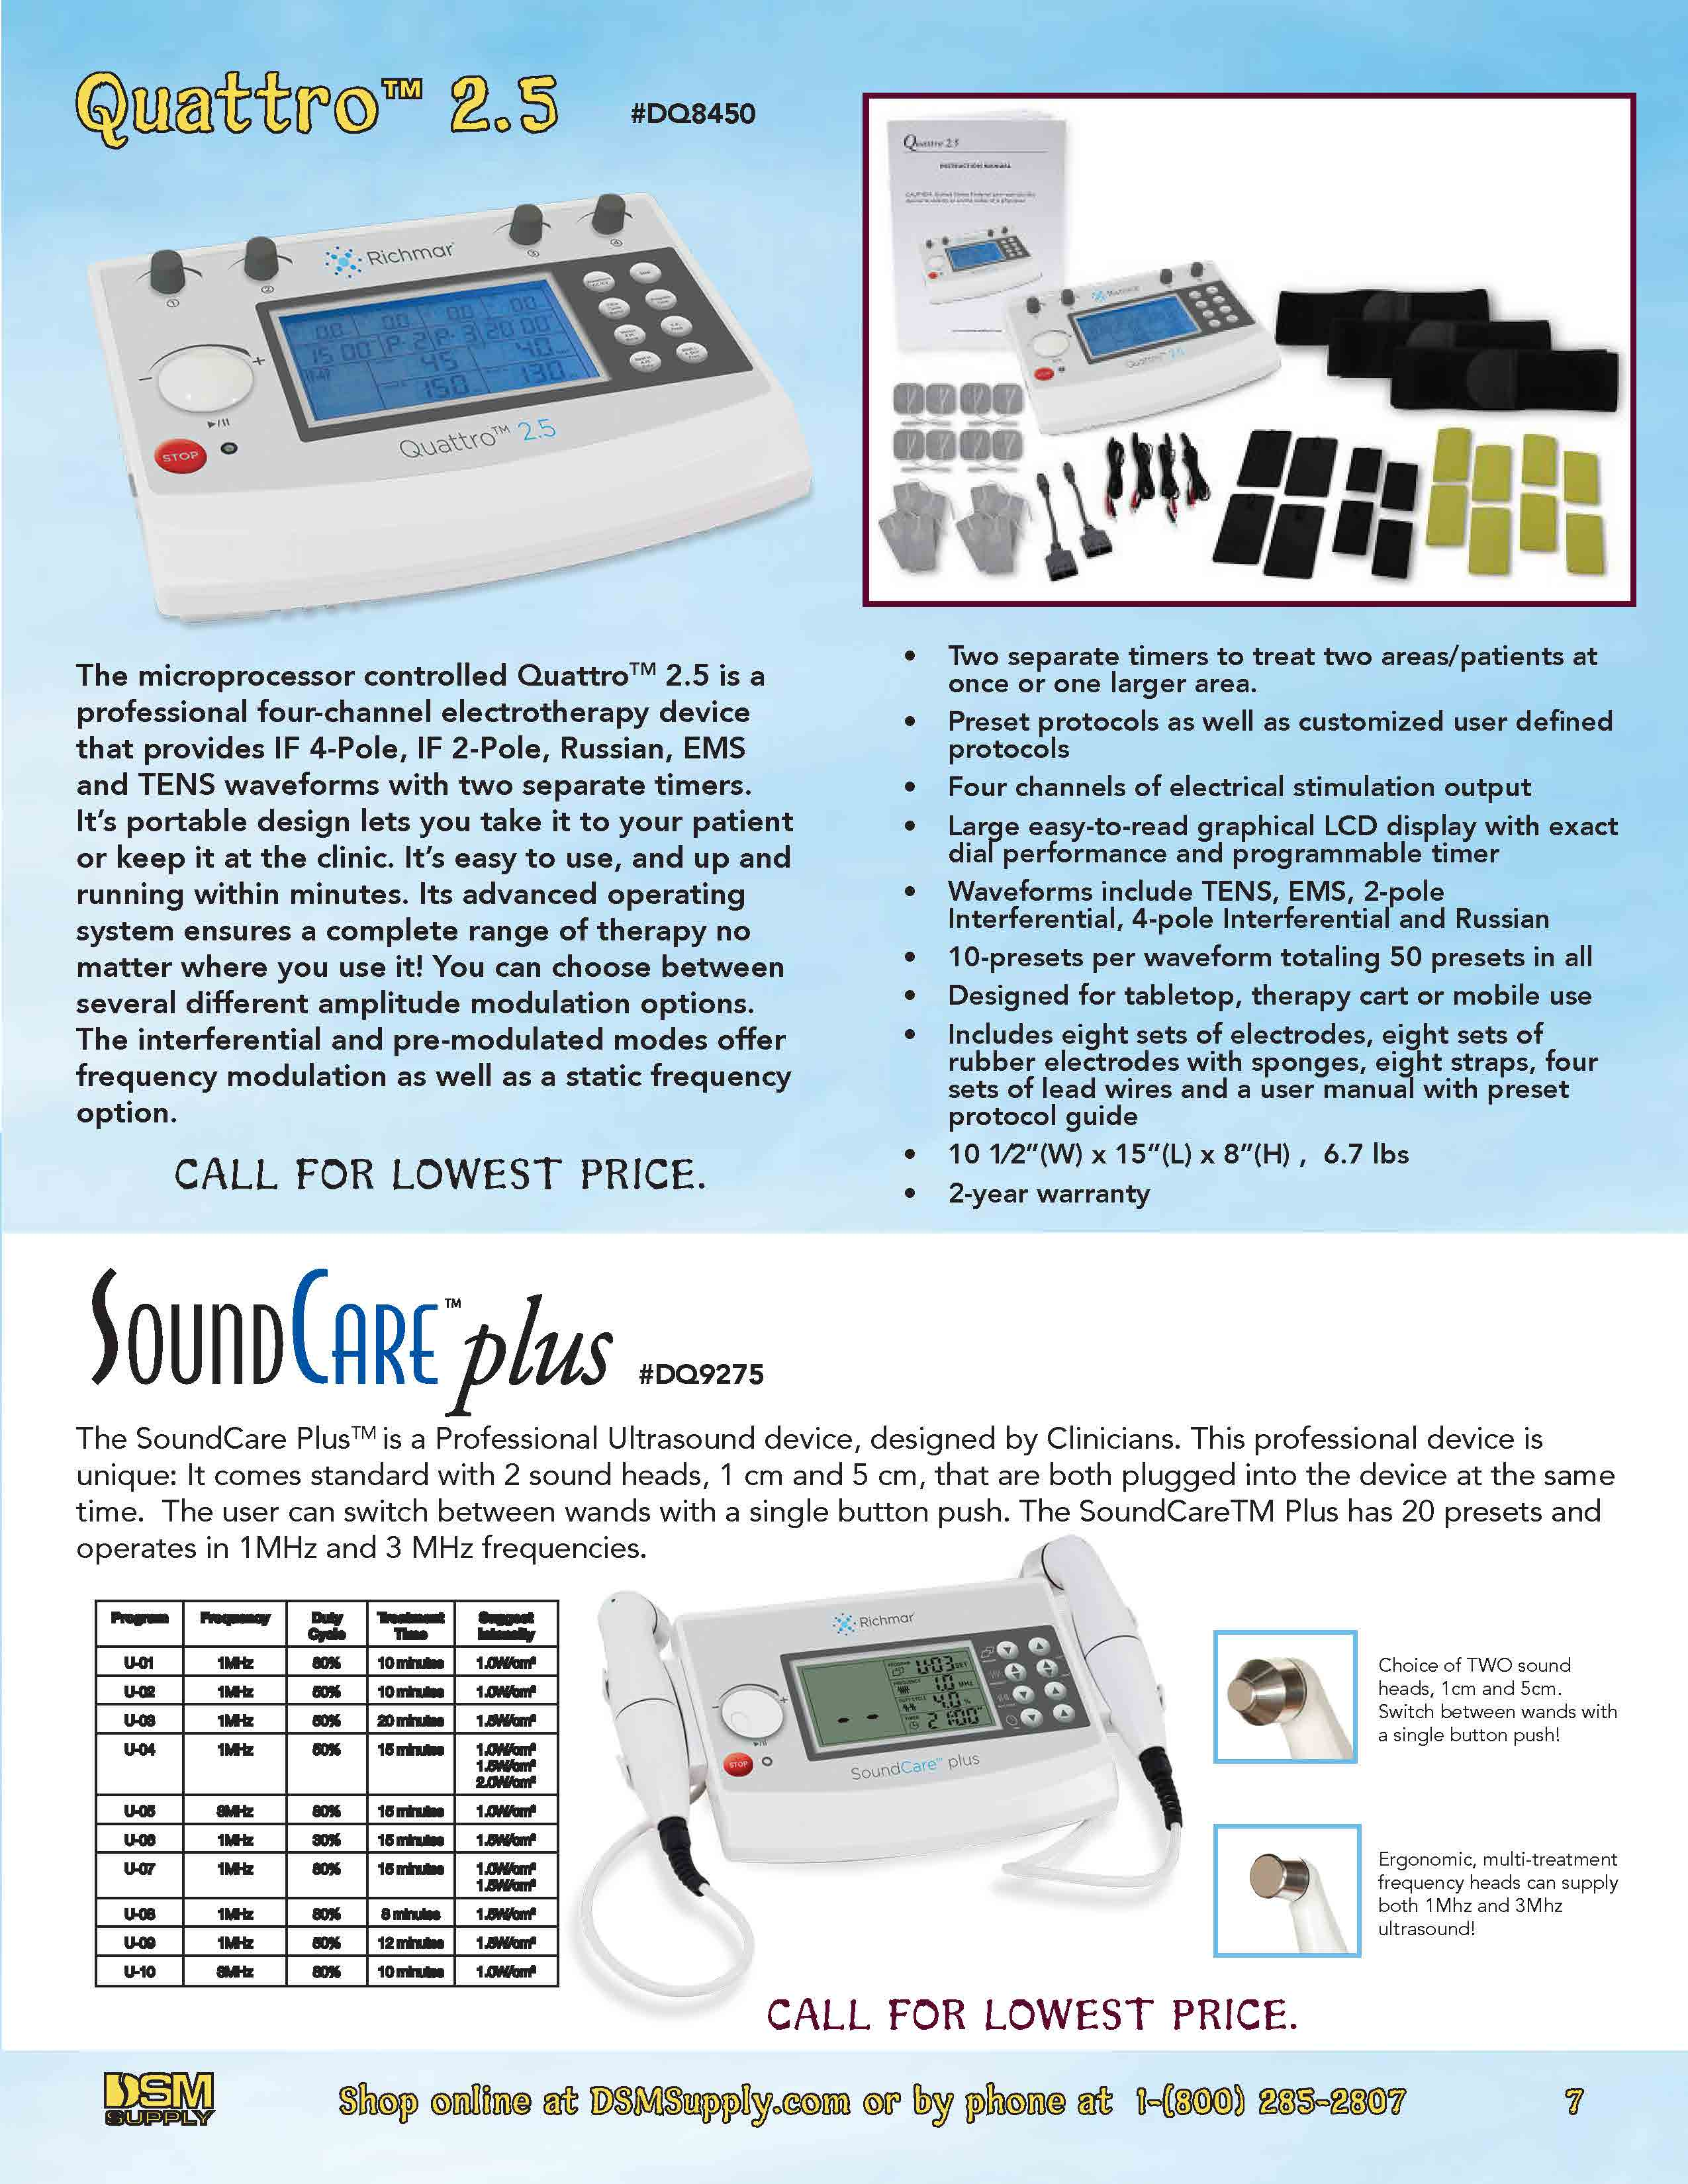 DSM Spring Catalog 2020 - no bleed - 09.